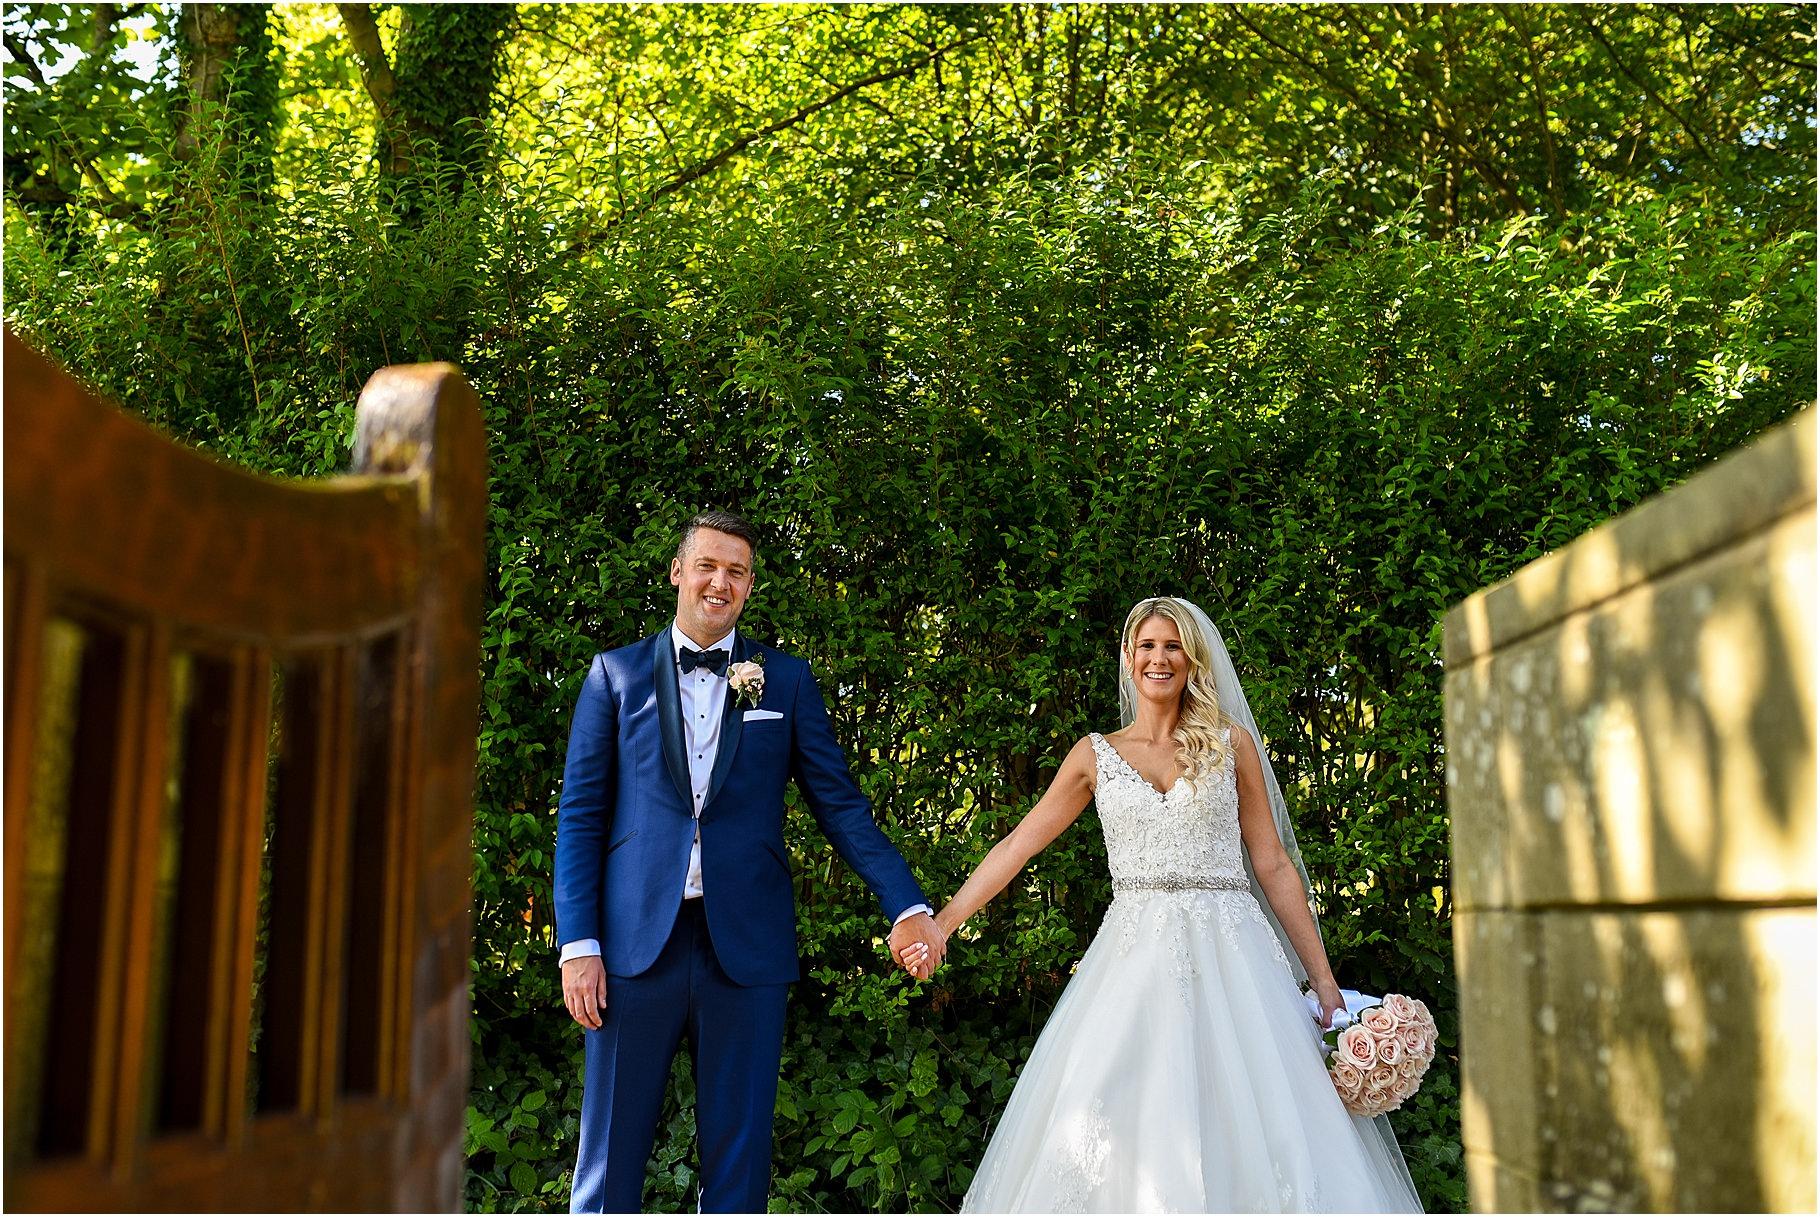 the-villa-wrea-green-wedding-32.jpg